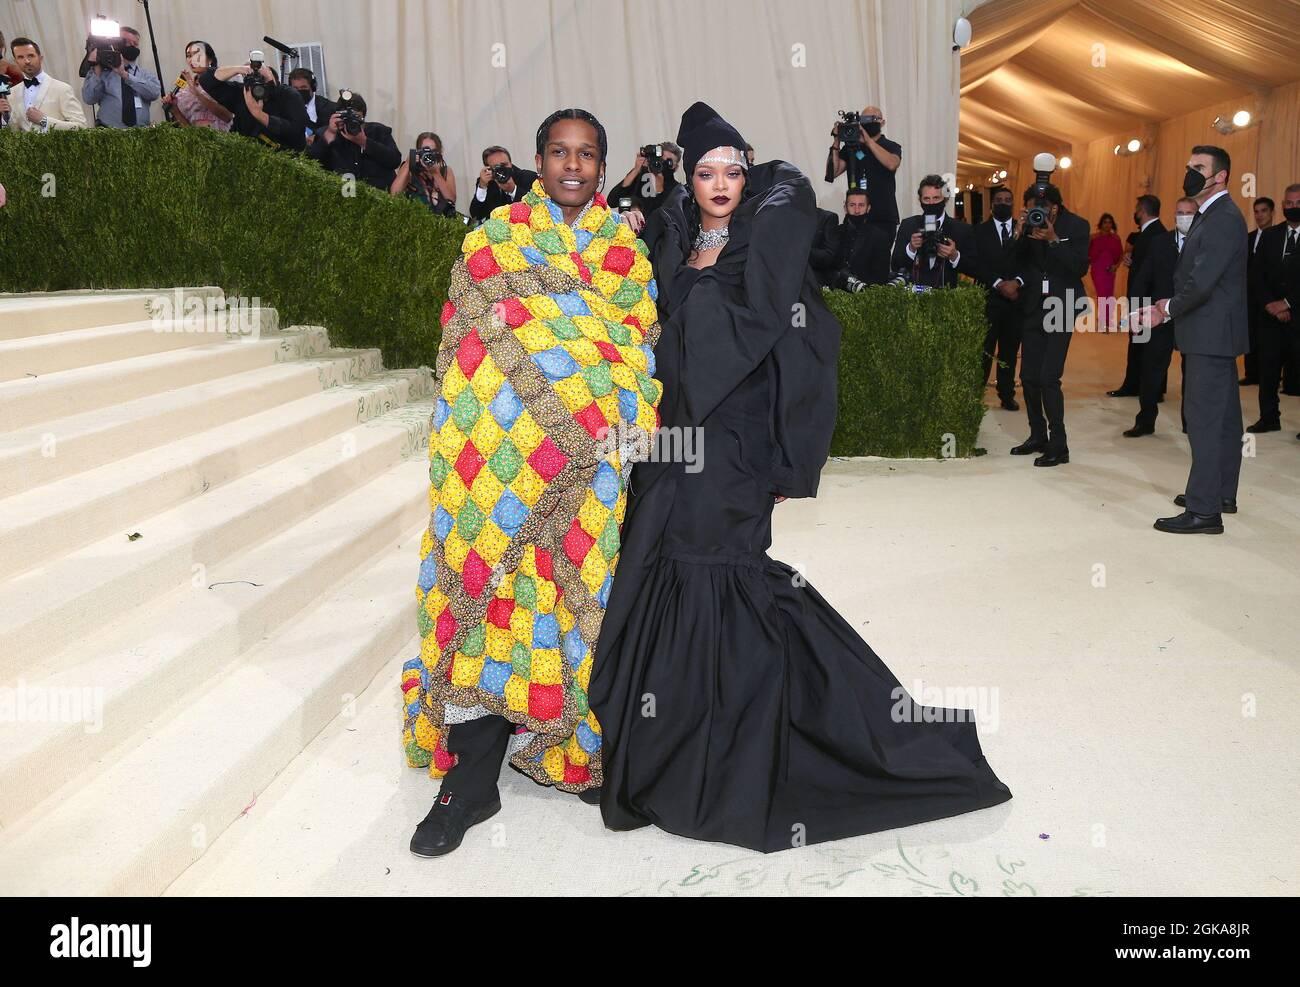 New York, USA. September 2021. Rihanna und ASAP Rocky nehmen am 13. September 2021 an der Benefit Gala 2021 des Metropolitan Museum of Art Costume Institute in New York City, NY, USA Teil. Foto von Charles Guerin/ABACAPRESS.COM Quelle: Abaca Press/Alamy Live News Stockfoto